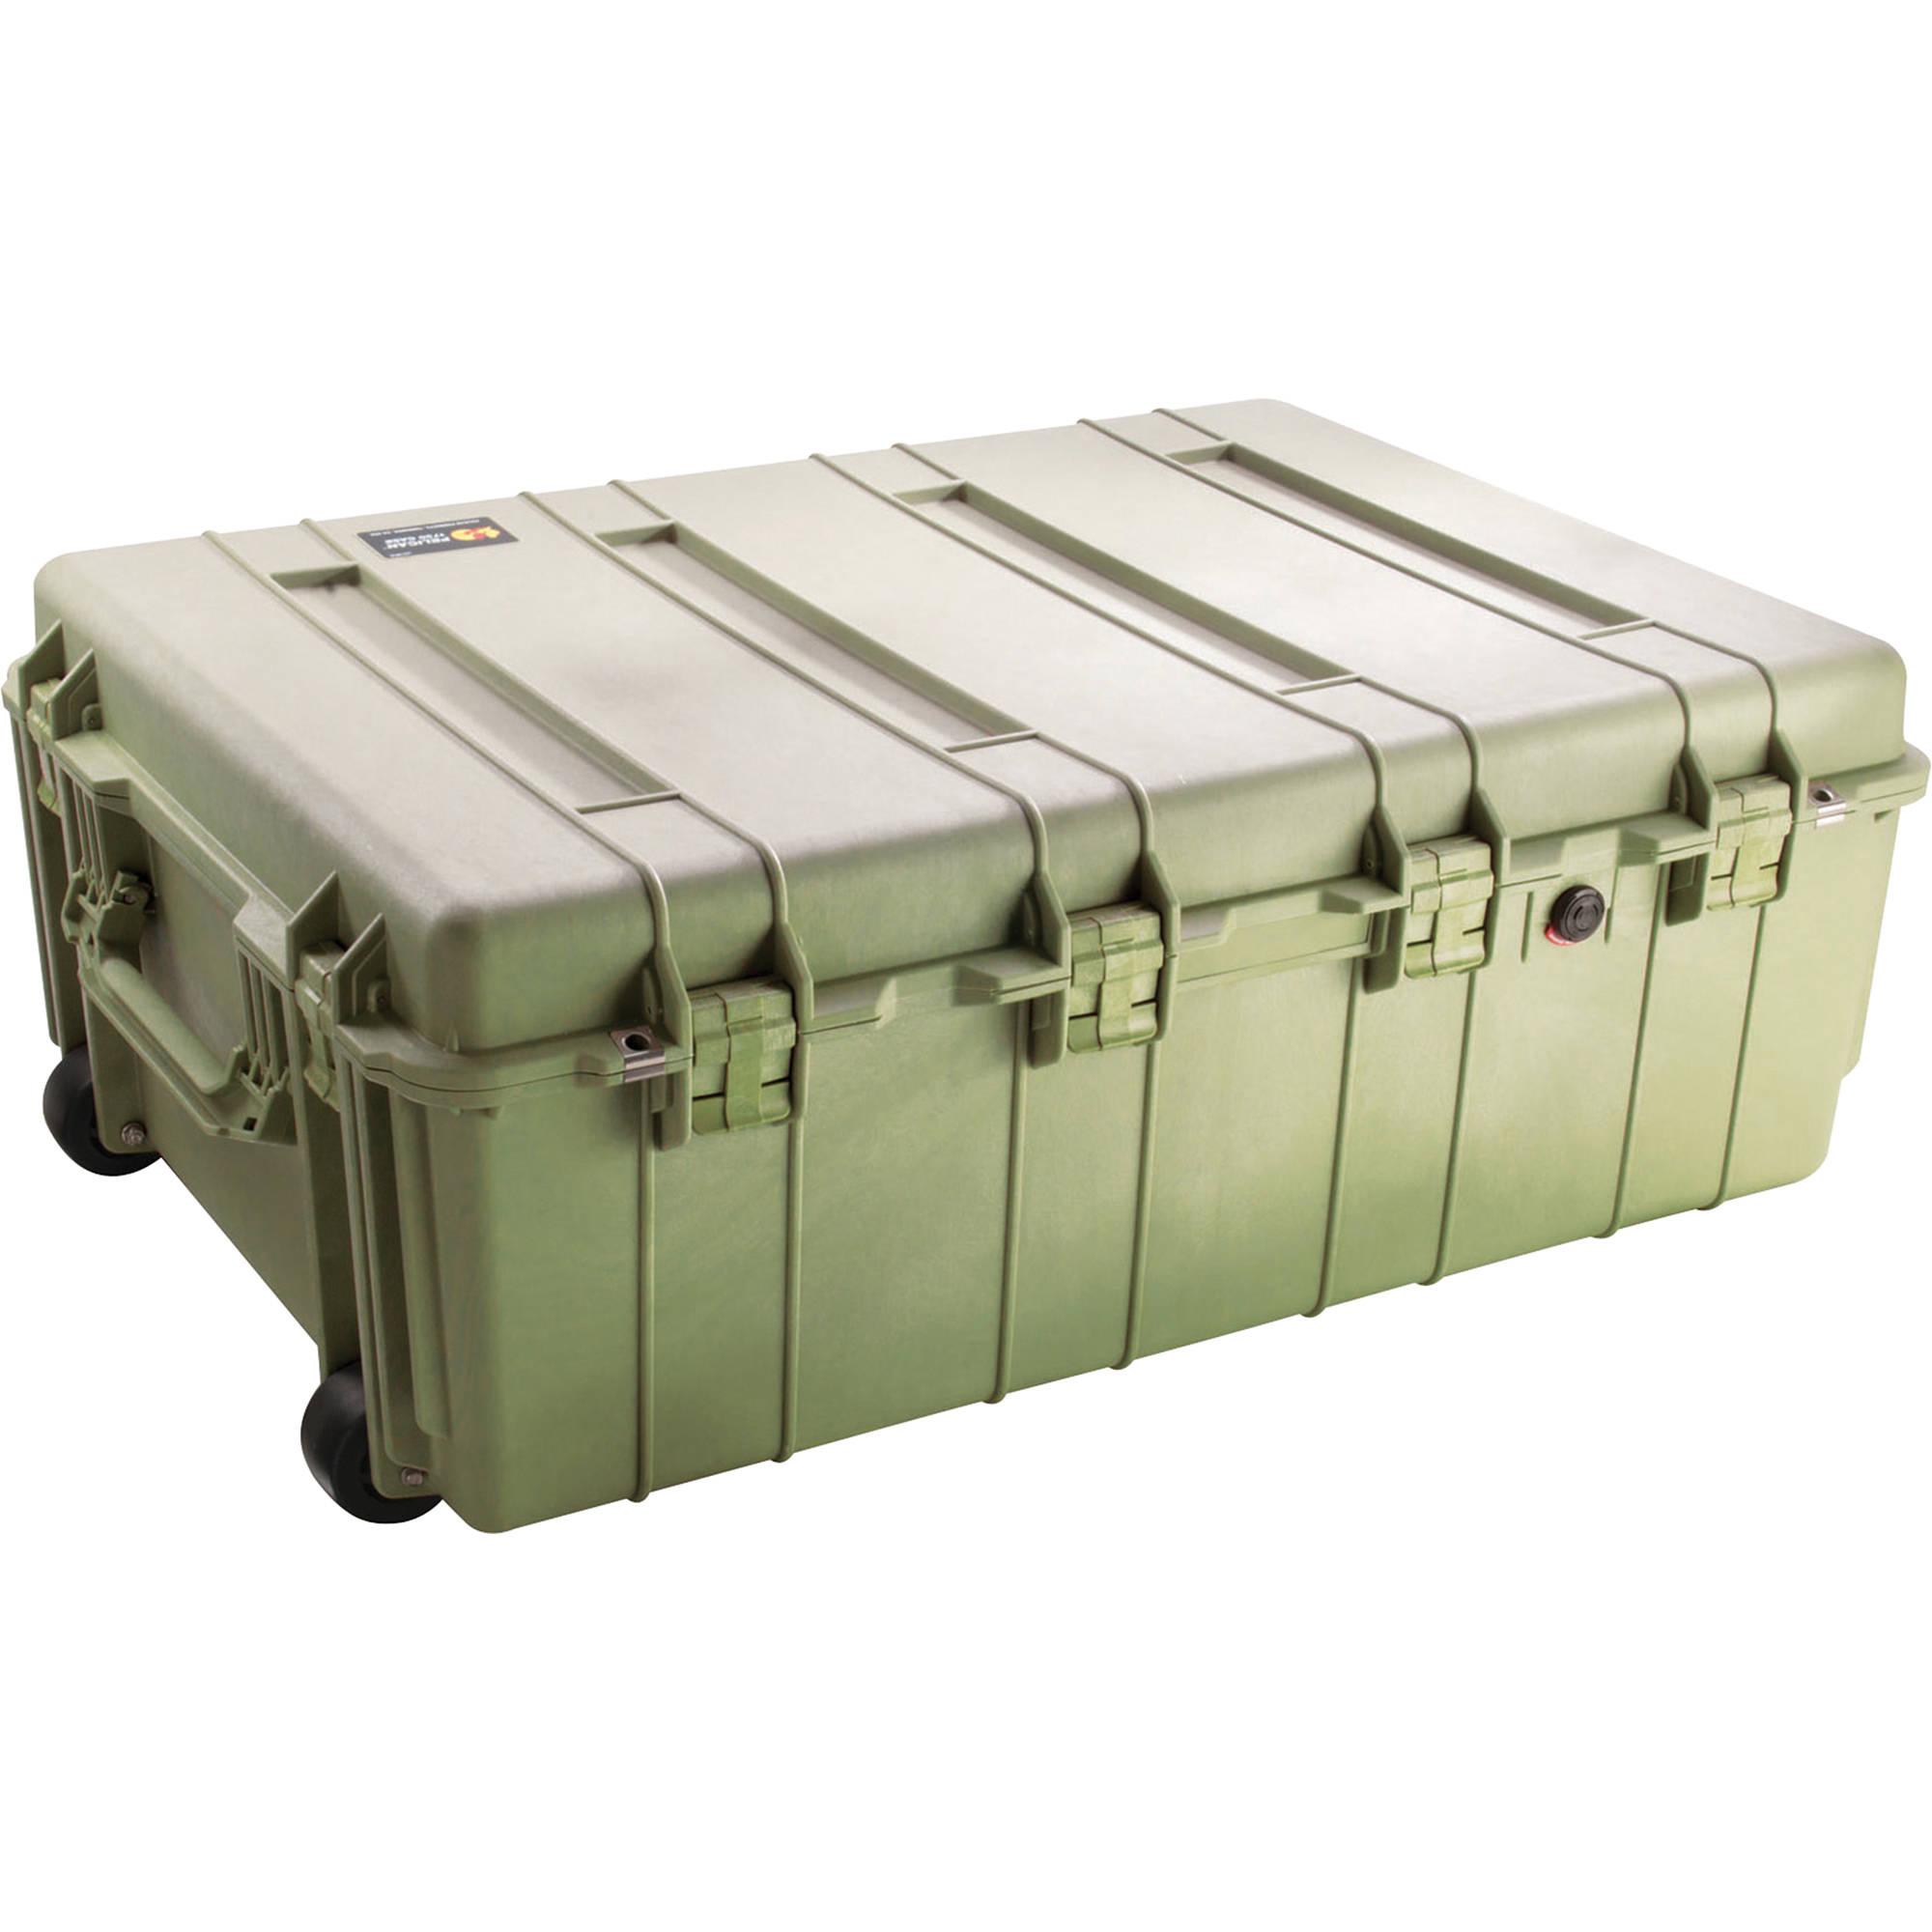 Pelican 1730 Transport Case (Olive Drab Green)